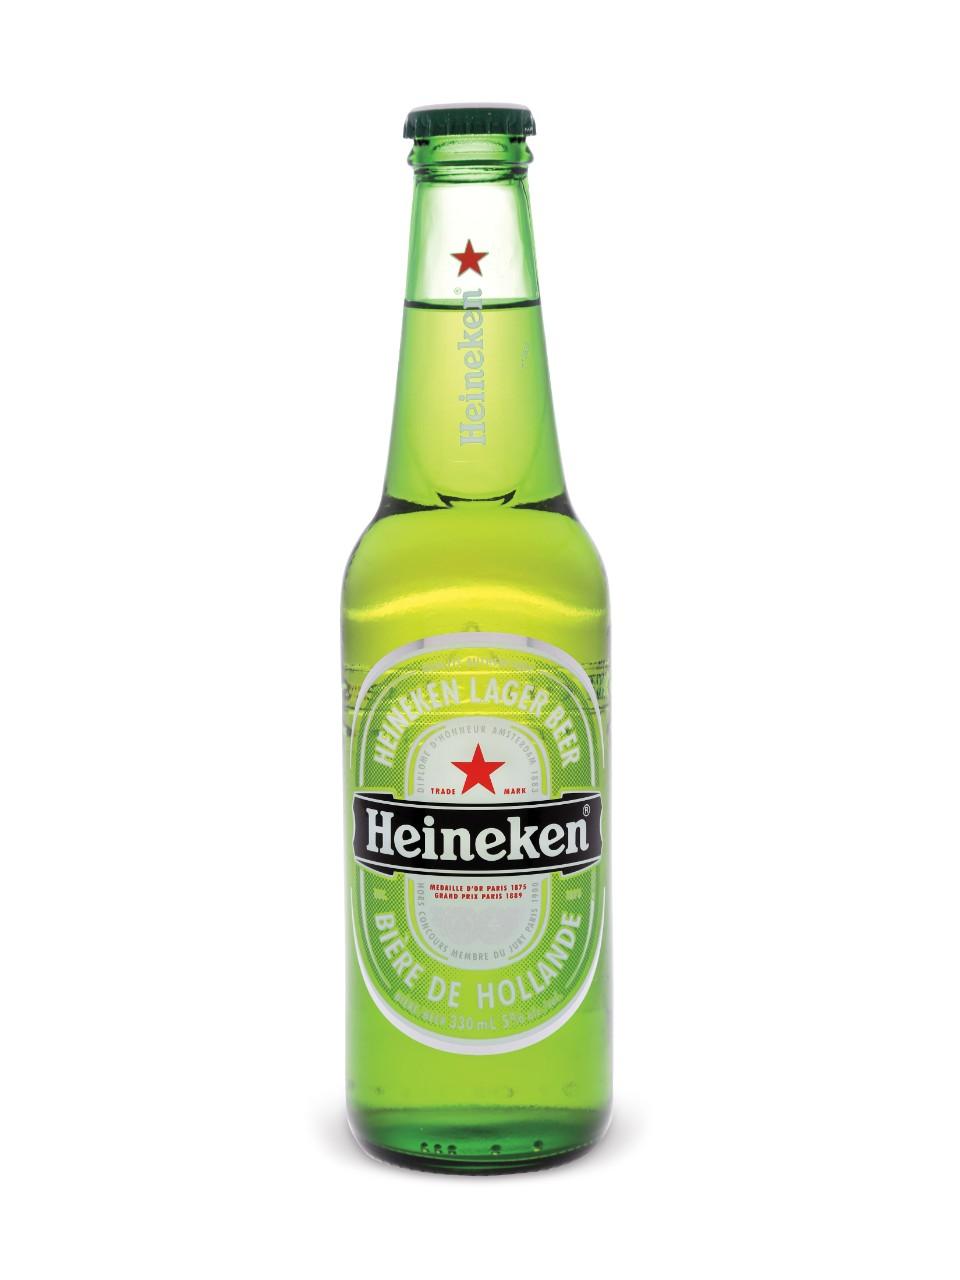 Heineken Bottle Image